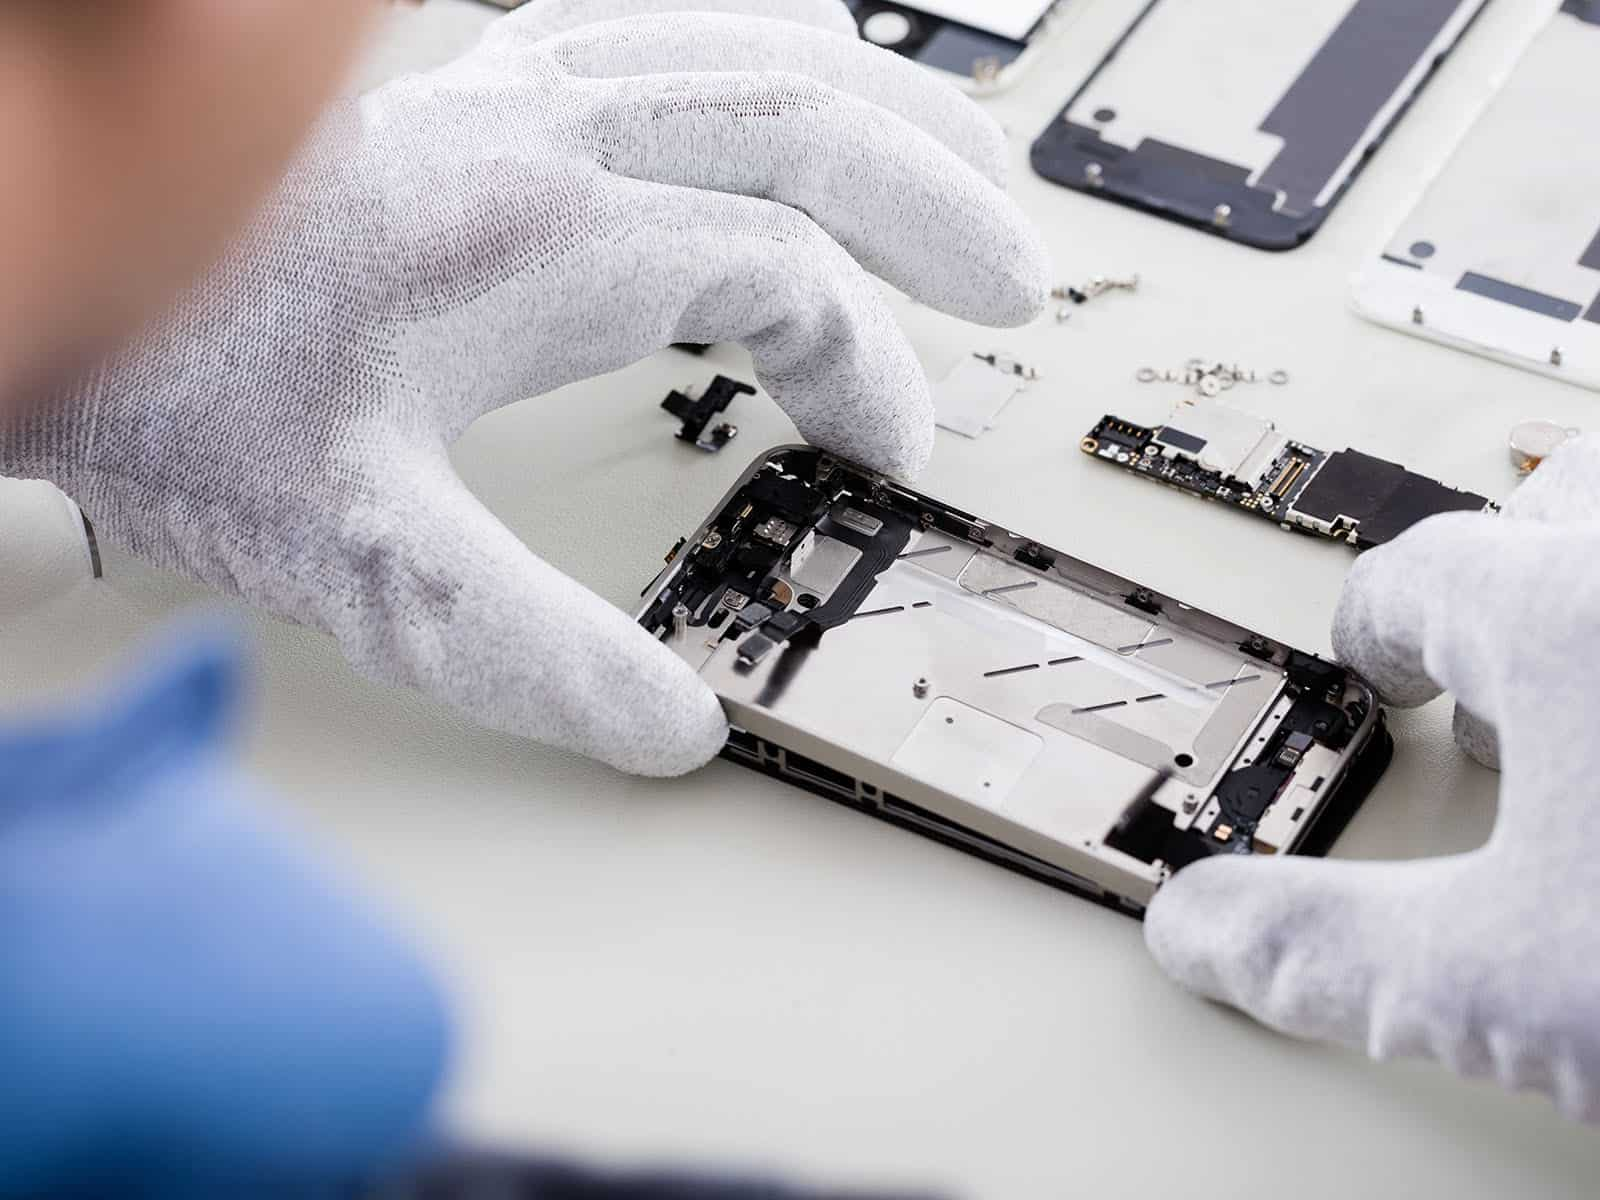 Samsung Galaxy repair experts